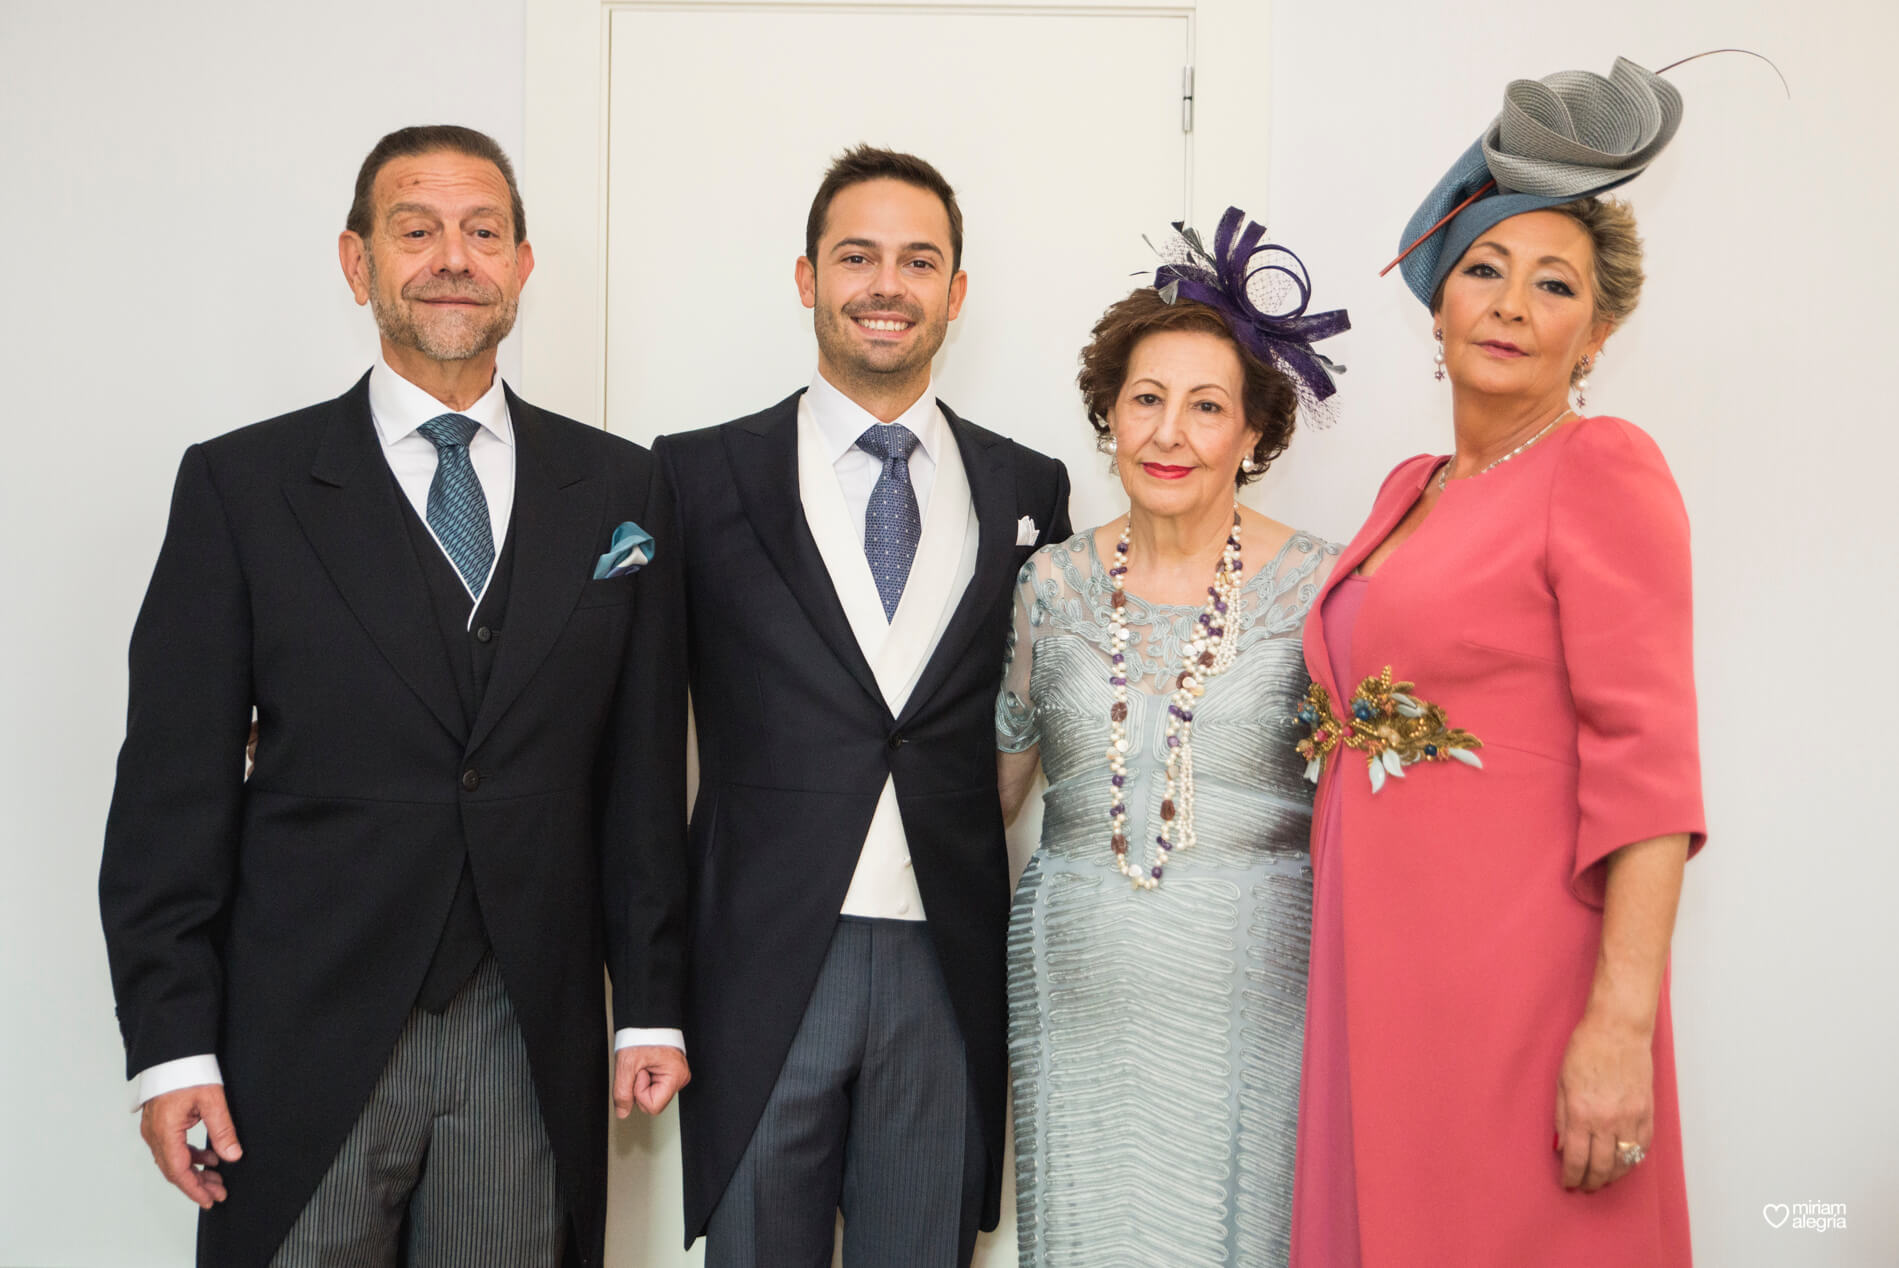 vestido-de-novia-paula-del-vas-miriam-alegria-fotografos-boda-murcia-175